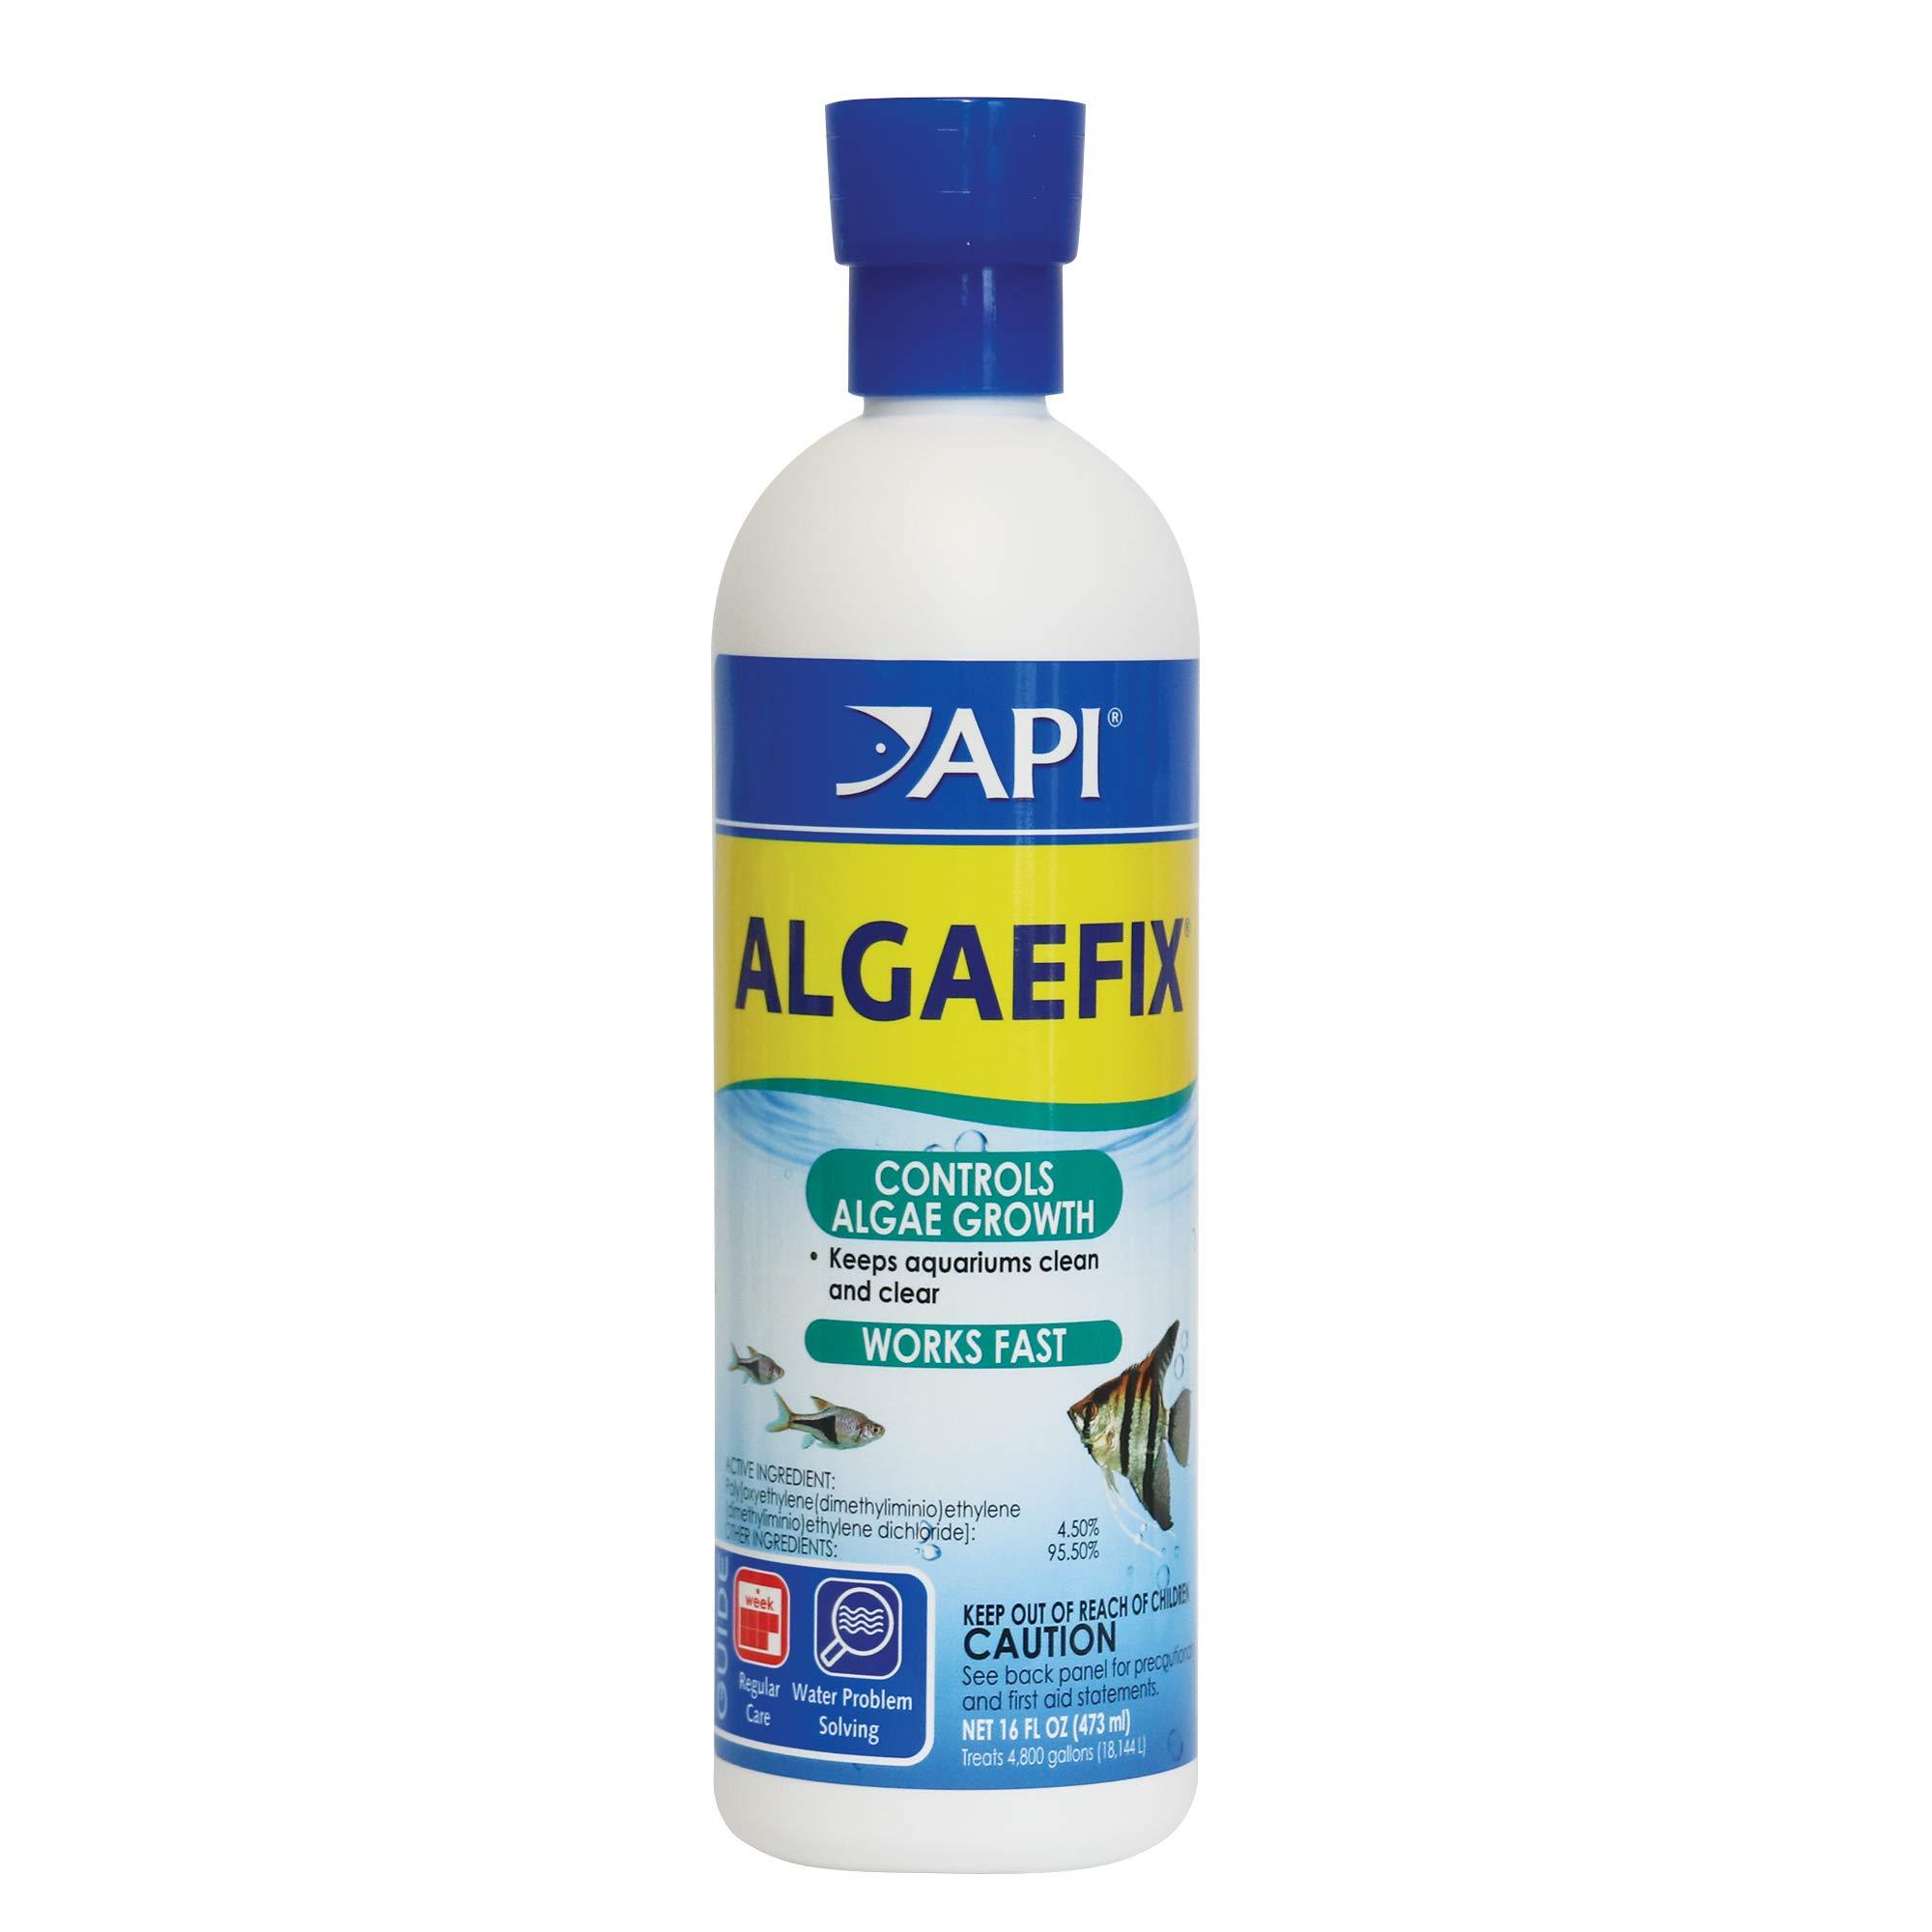 Amazon price history for API Algaefix Algae Control (16 oz)